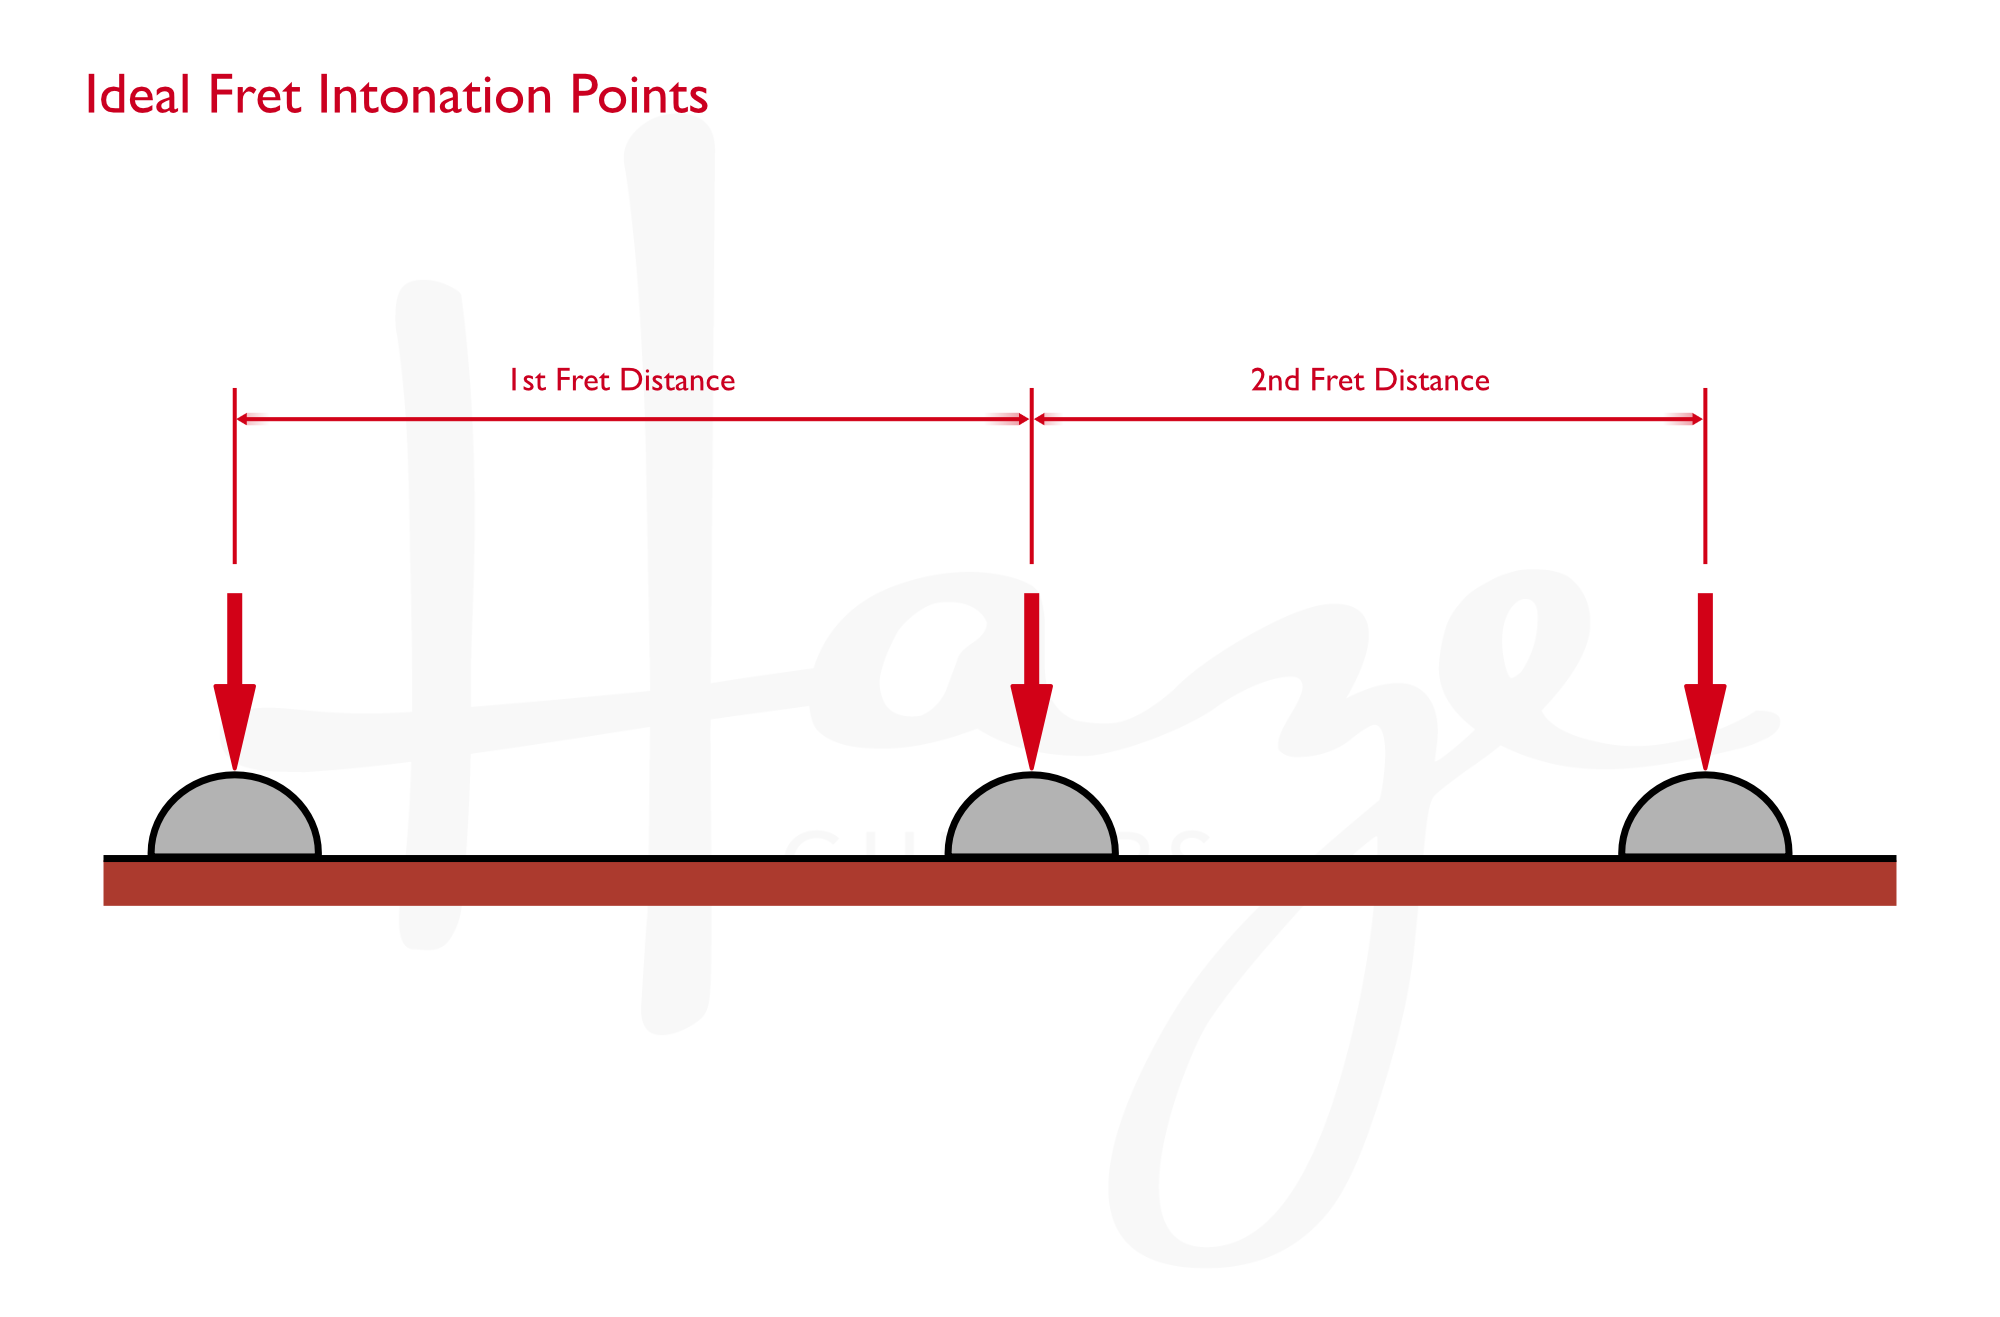 the impact of frets on intonation